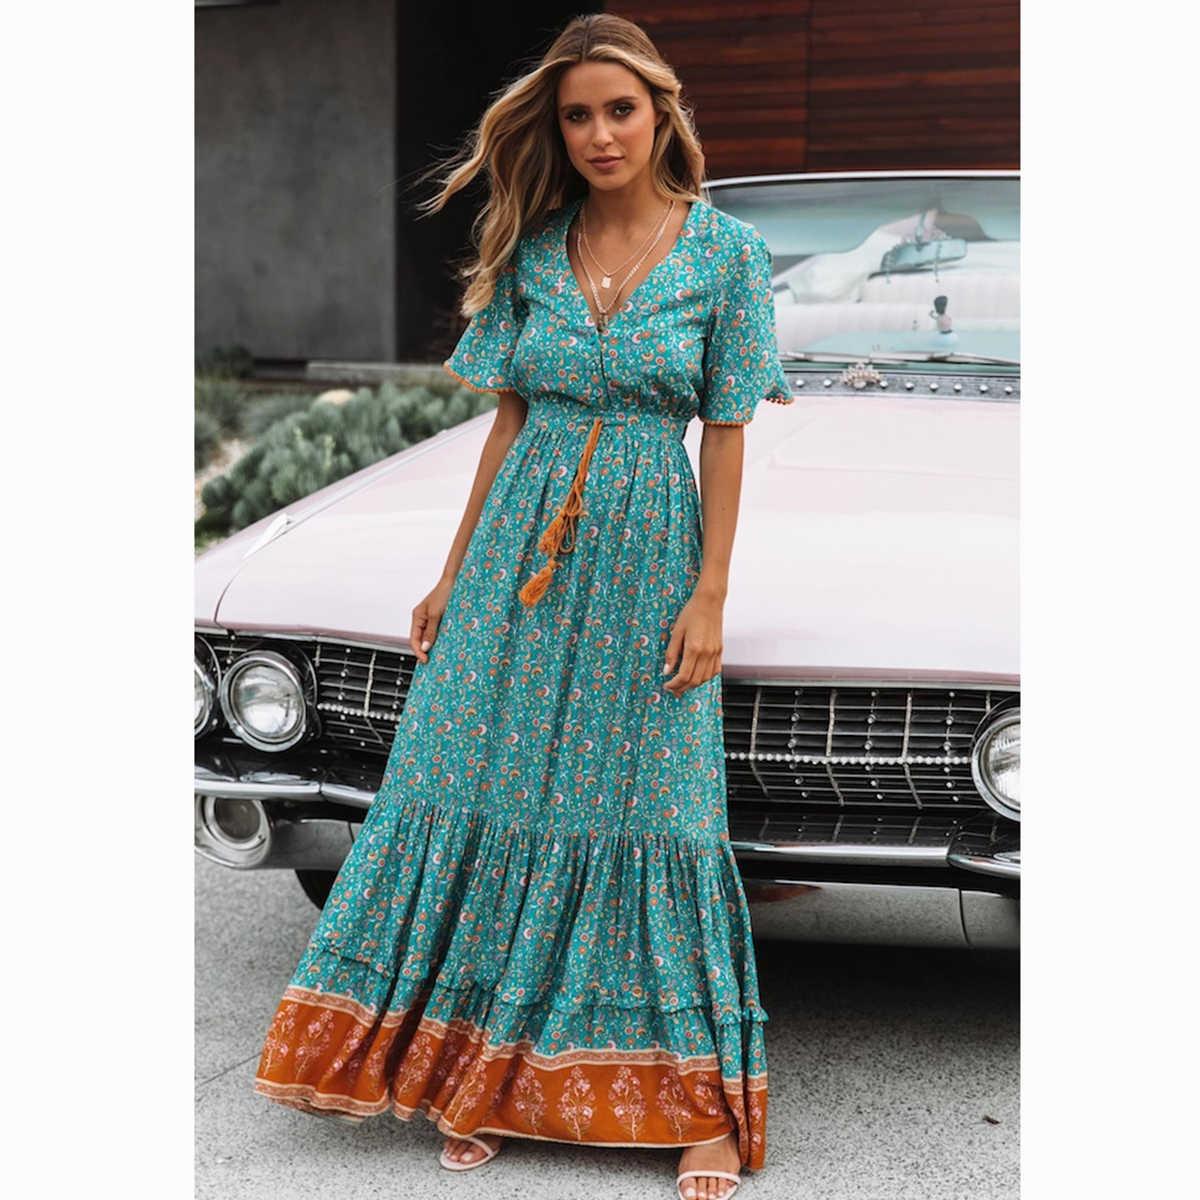 644d7d2fd7814 Detail Feedback Questions about Frieda Retro Chic Maxi Dress Women ...